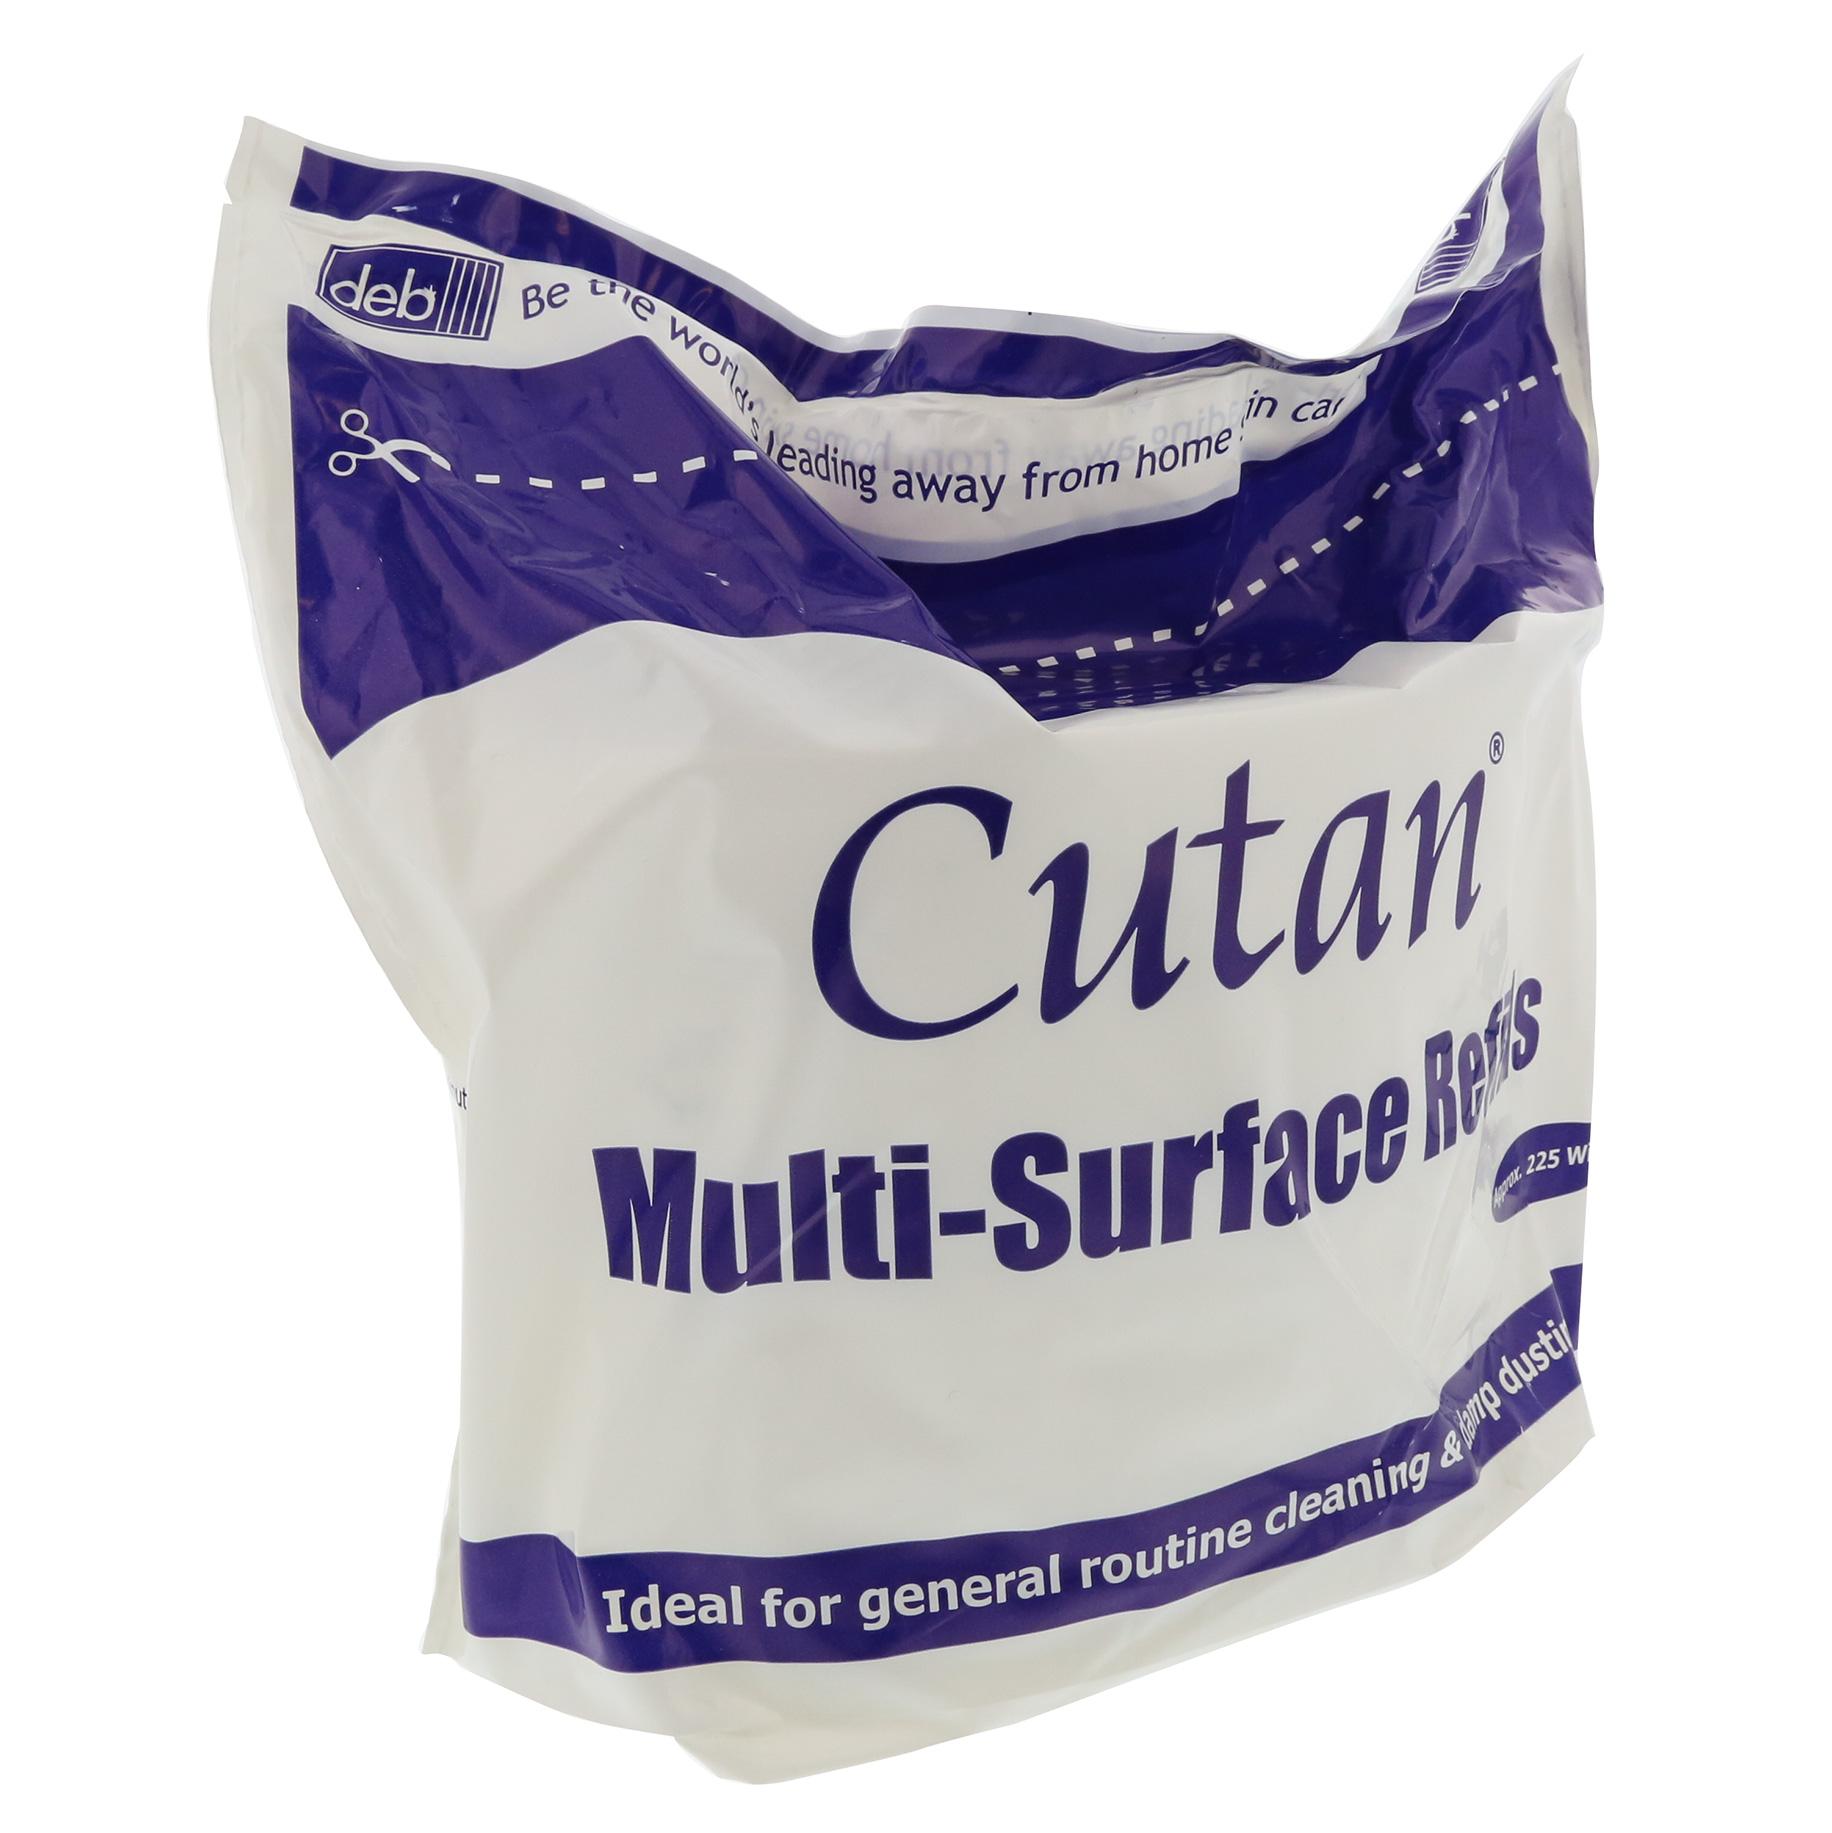 Cutan Multi-Surface Wipes Refill Pack 225